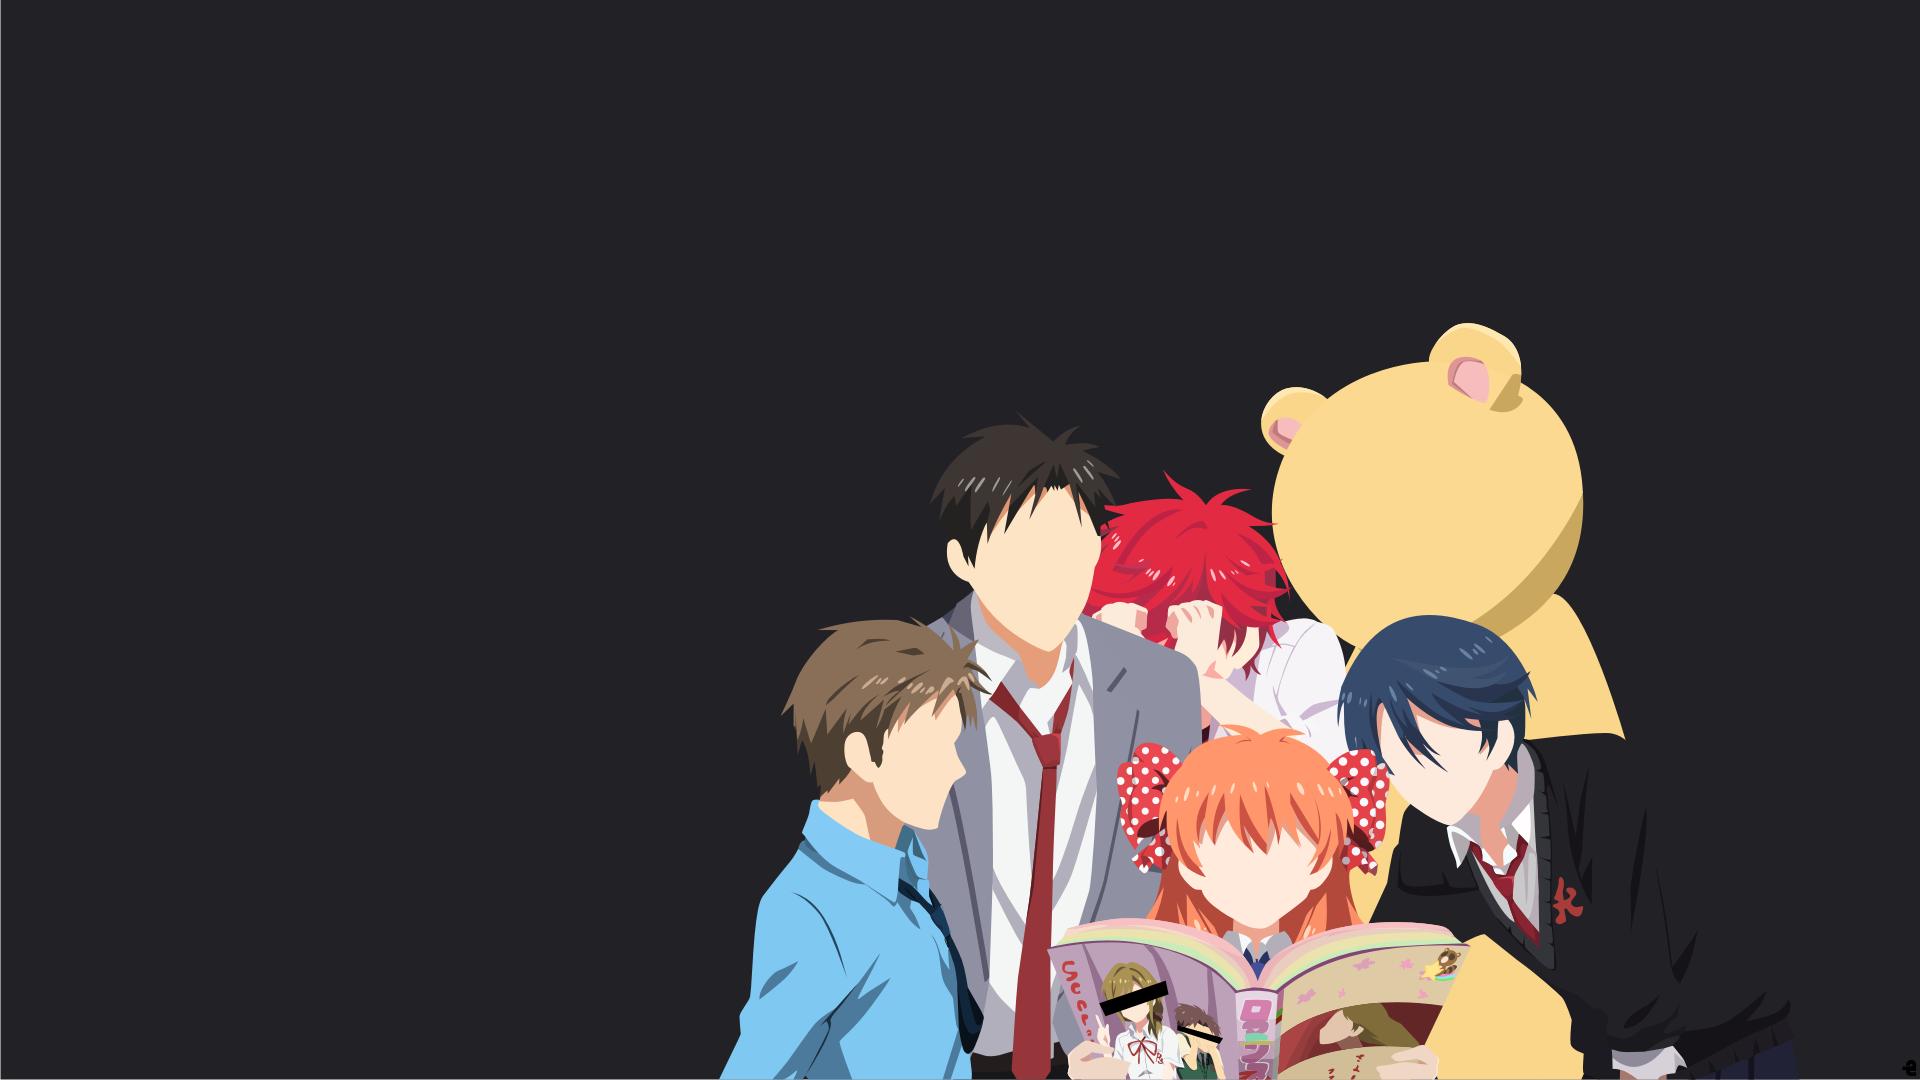 Wallpaper Illustration Anime Cartoon Gekkan Shoujo Nozaki Kun